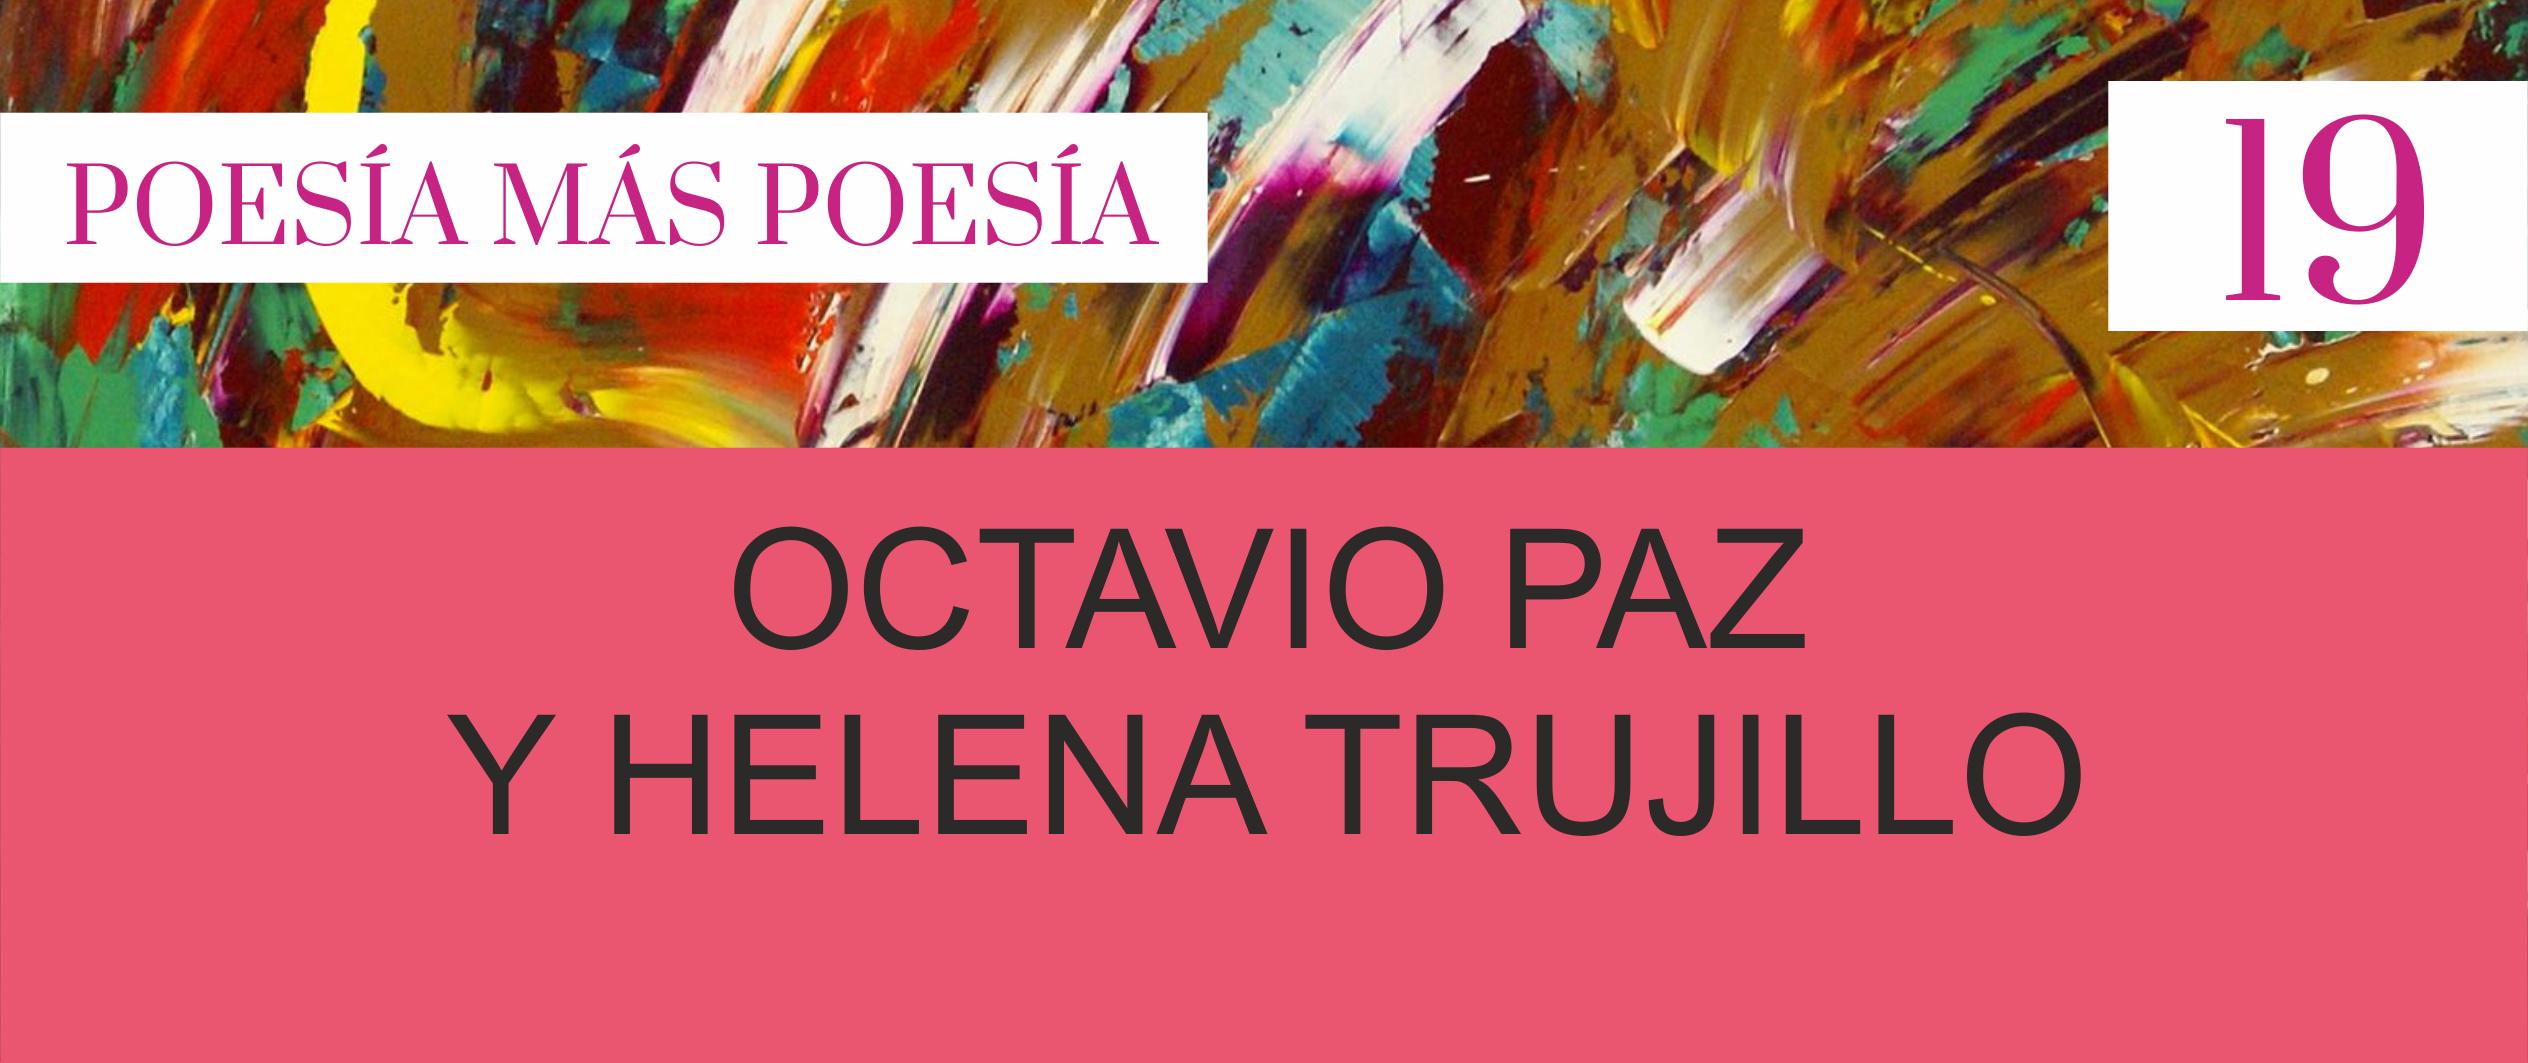 19 - Poesia Online